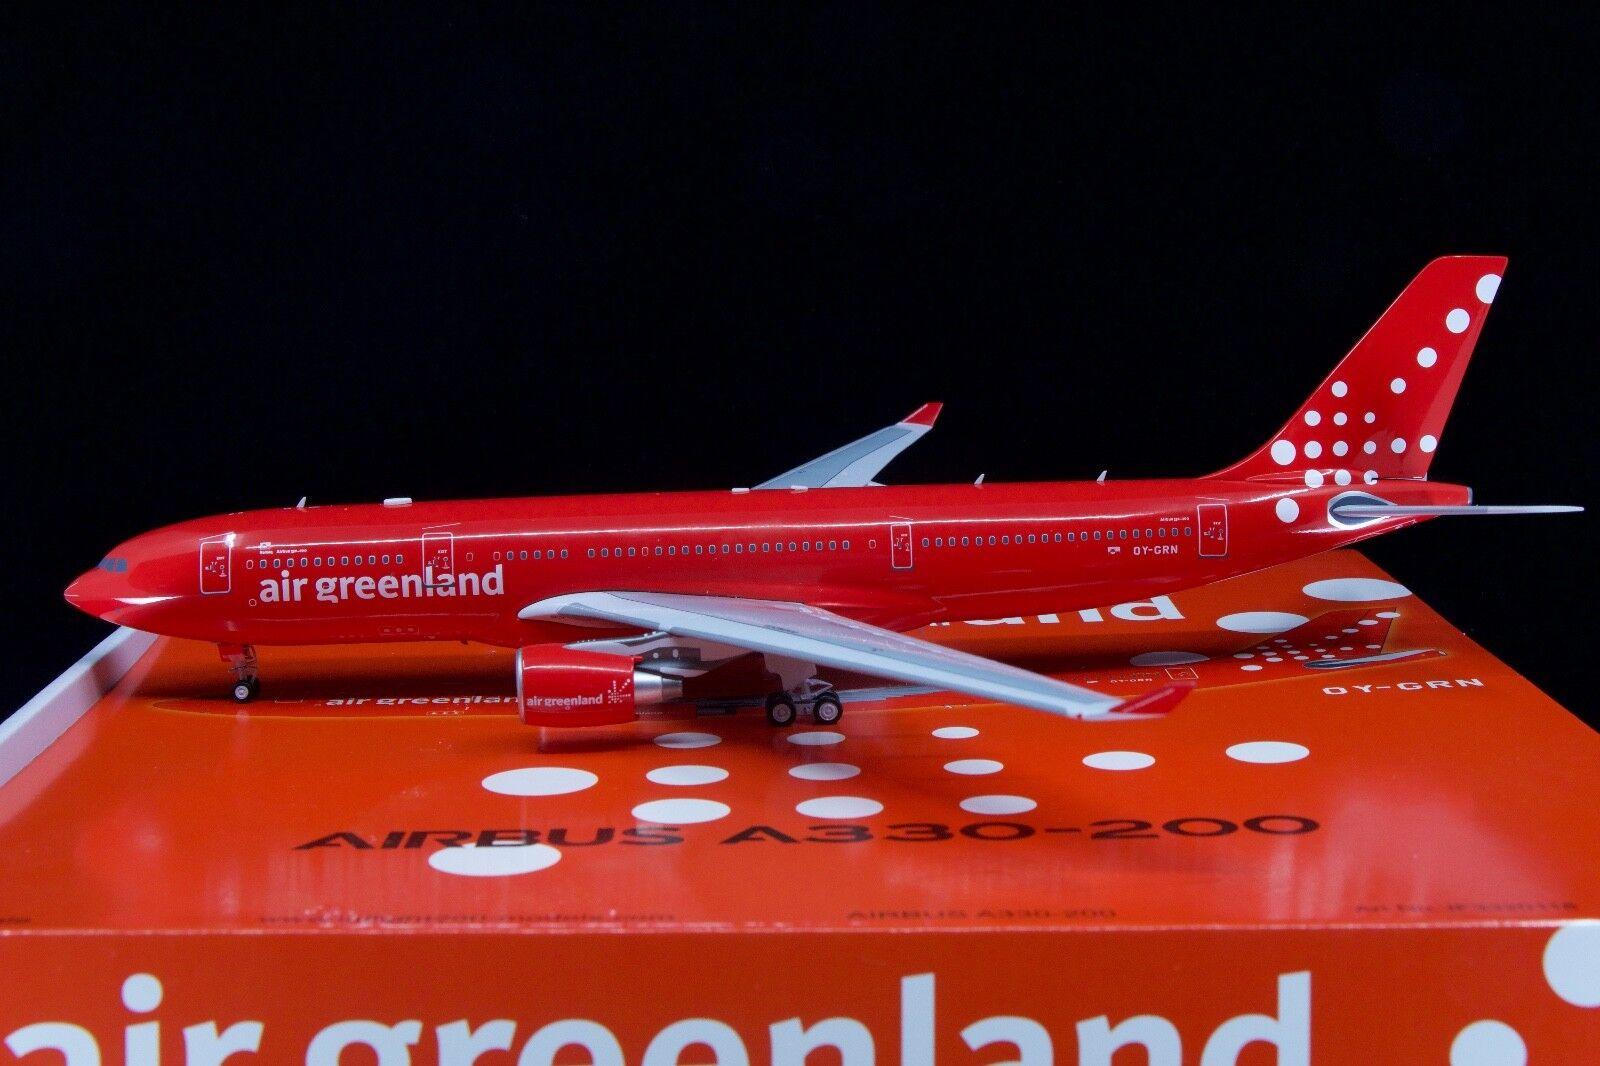 Inflight200 1 1 1 200 A330-200 Air Greenland OY-GRN 18410a